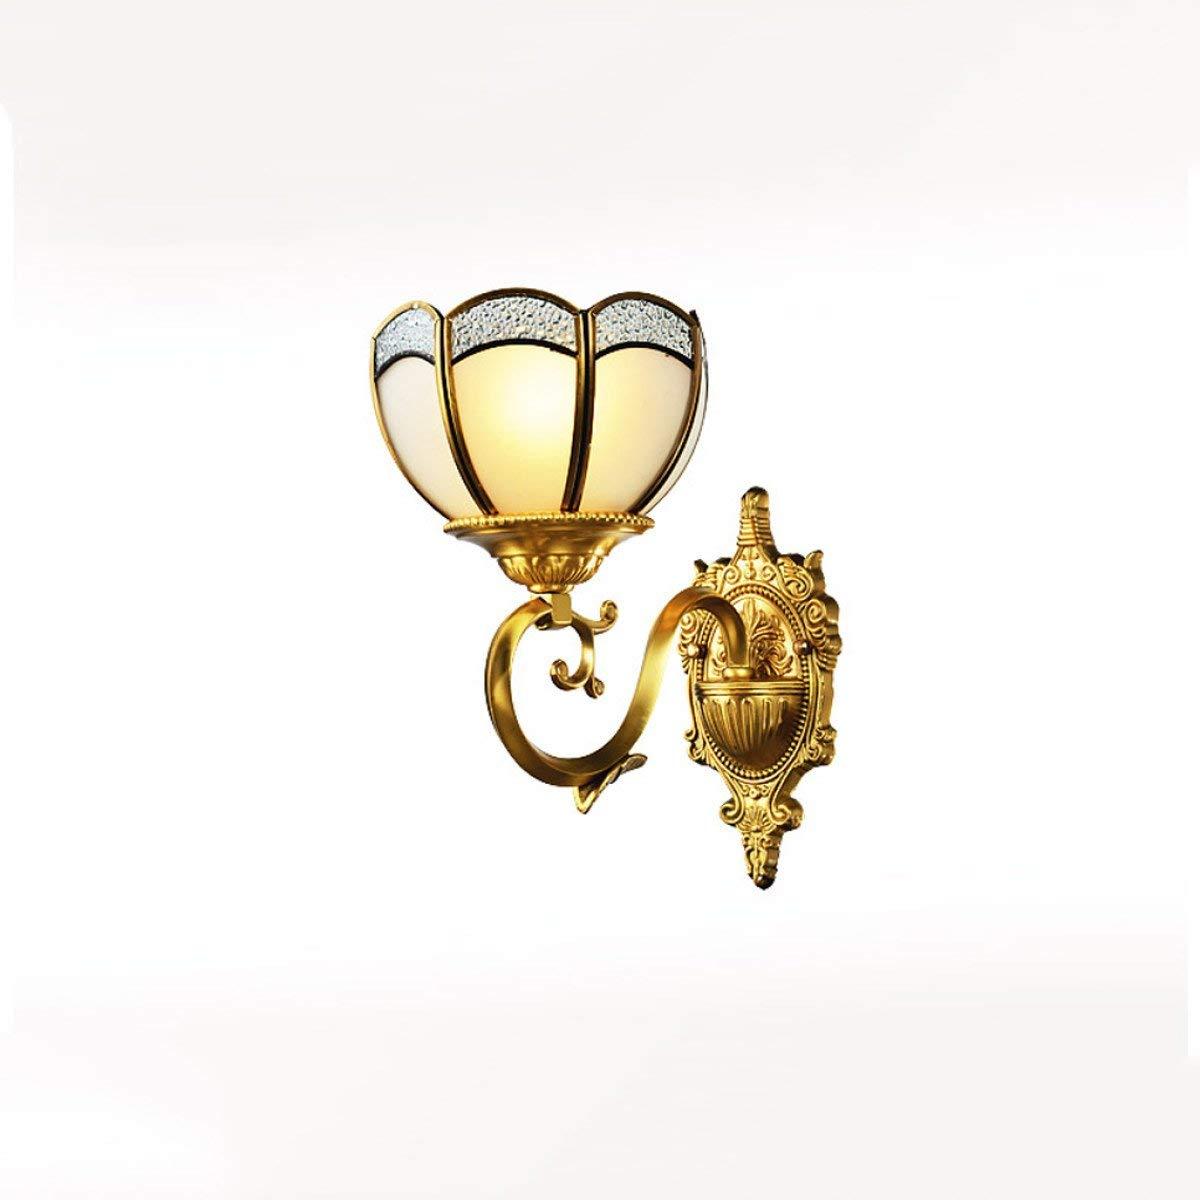 BXJ Europeantyleフル銅ウォールランプリビングルームの壁ランプ寝室の壁ランプベッドヘッド壁ランプ廊下の壁ランプ通路壁ランプE27光源 (Color : A) B07R8L7461 A